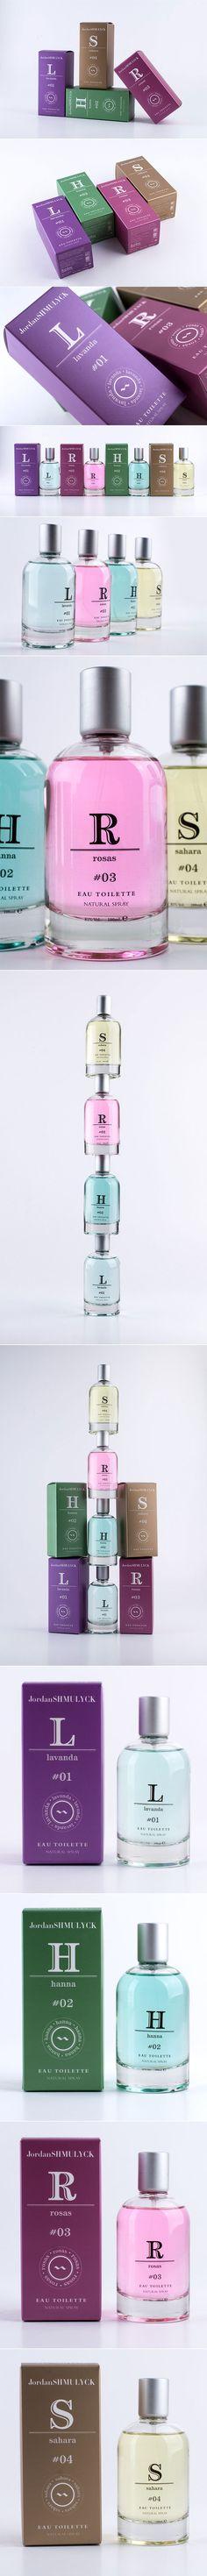 Jordan SHMULYCK Fragance. Design by spaincreative.es PD